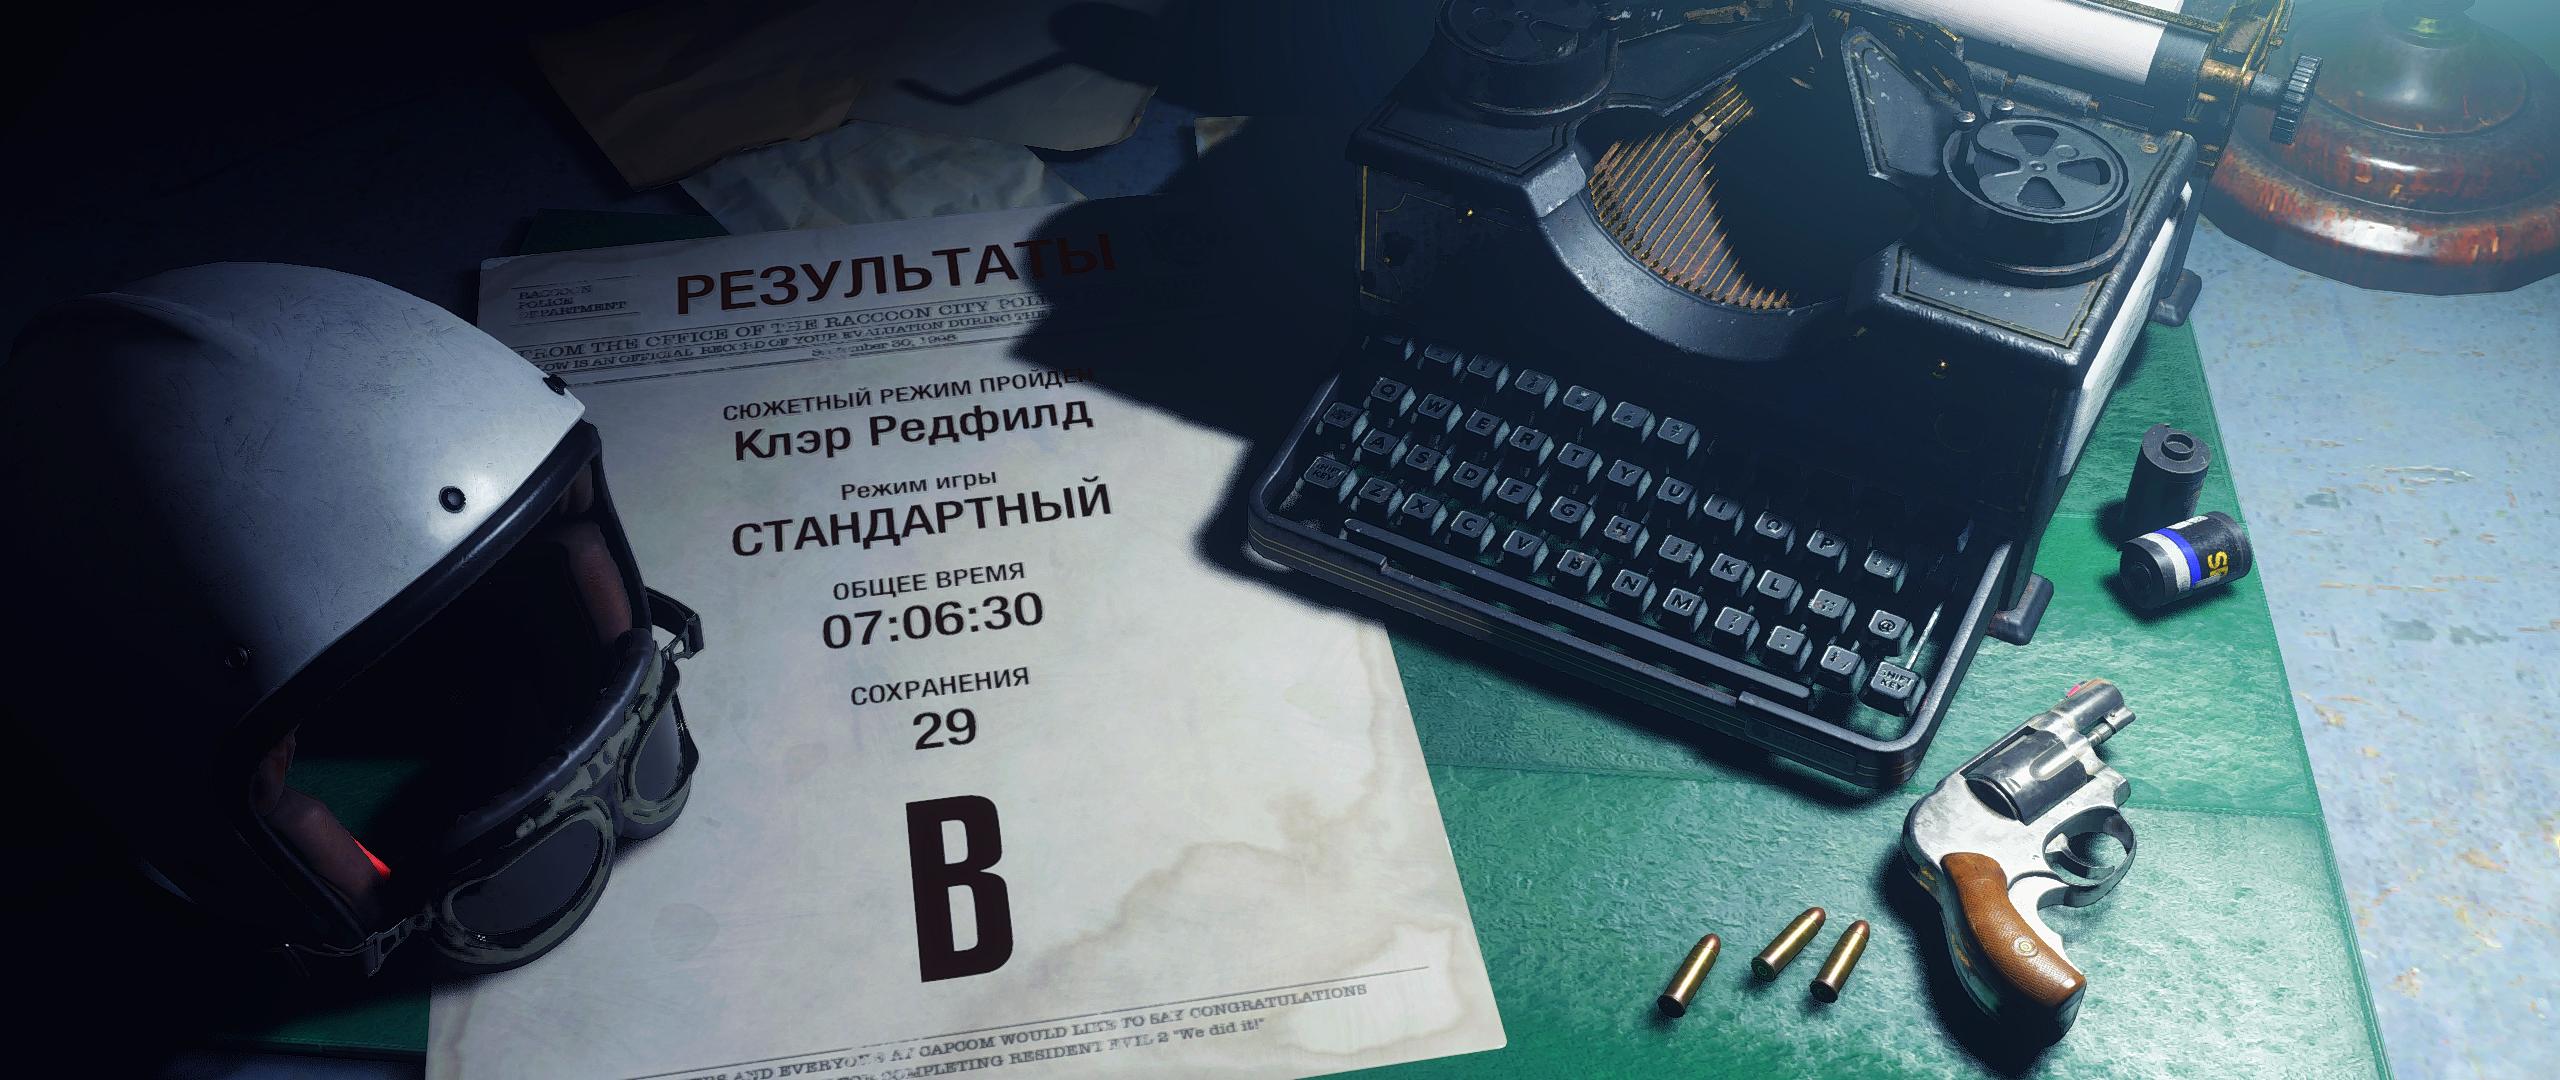 Desktop Screenshot 2019.03.31 - 17.03.48.95.png - Resident Evil 2